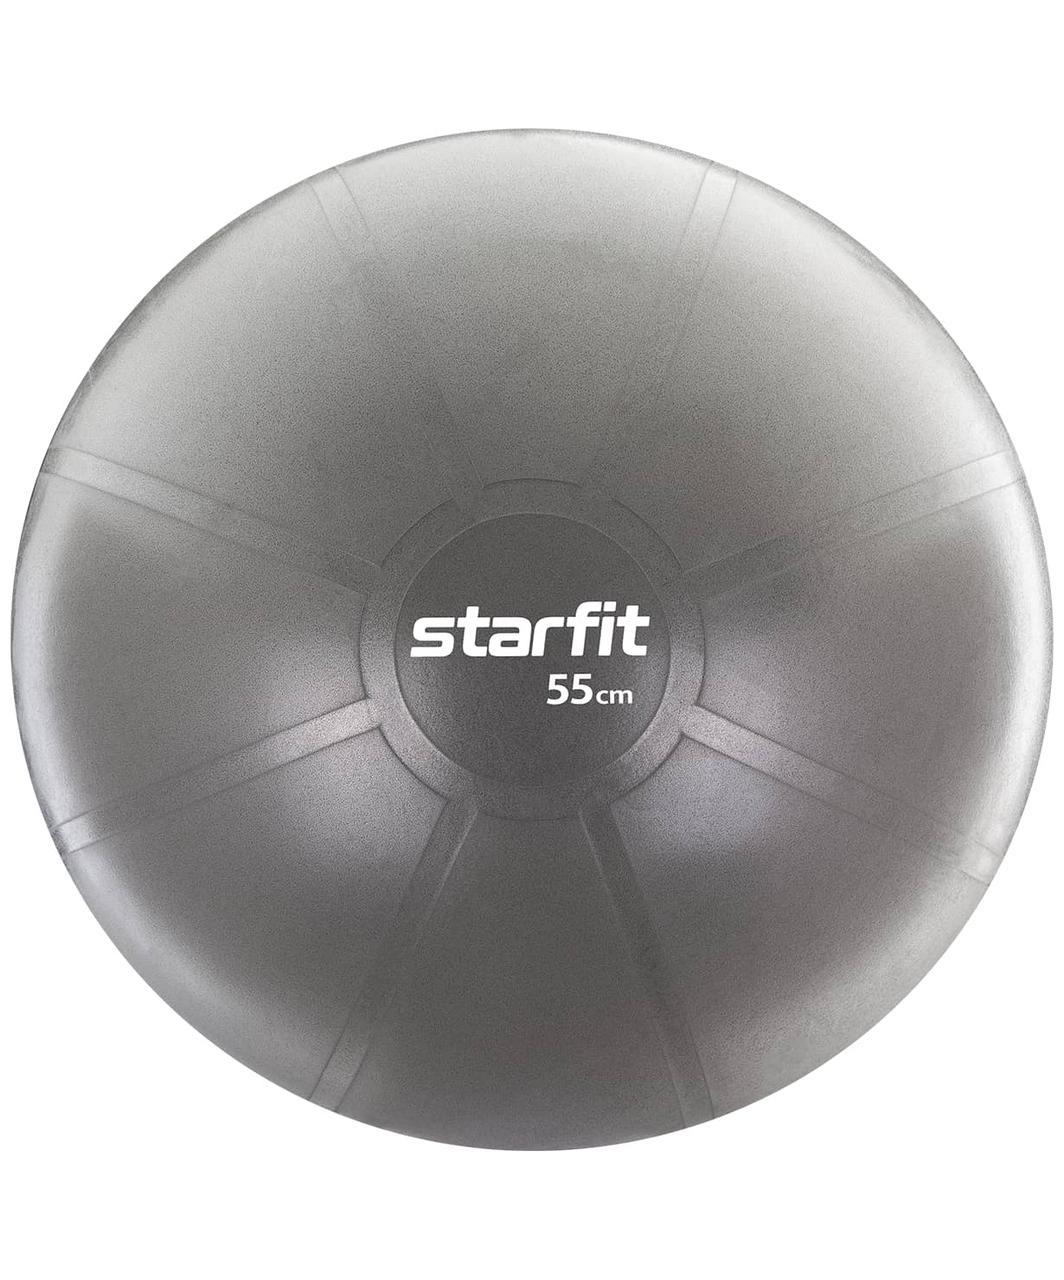 Фитбол PRO GB-107, 55 см, 1100 гр, без насоса, серый, антивзрыв Starfit